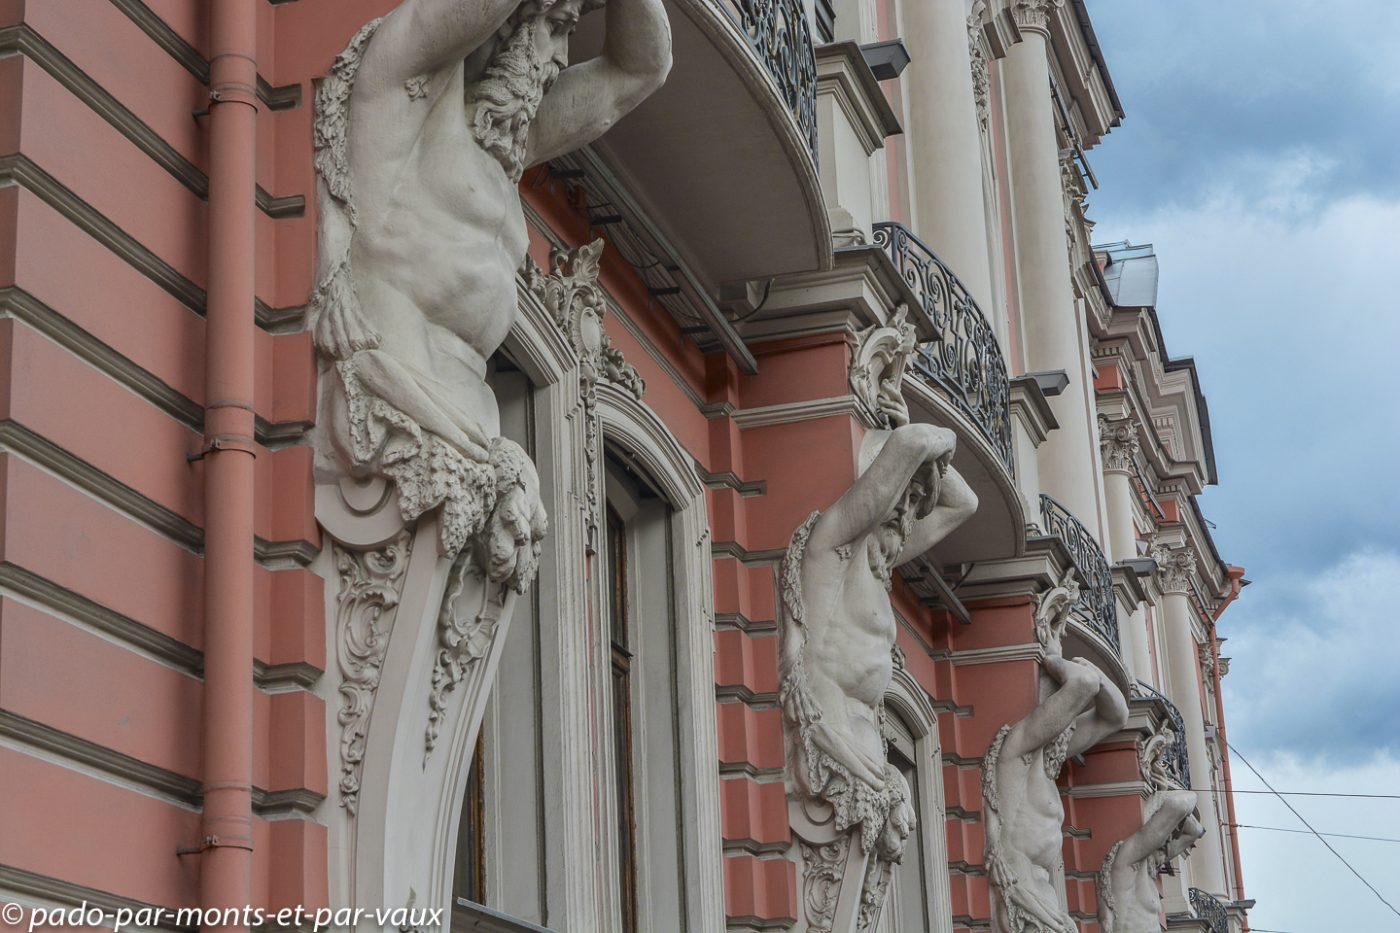 2015 - Saint Pétersbourg - Palais Belosselski